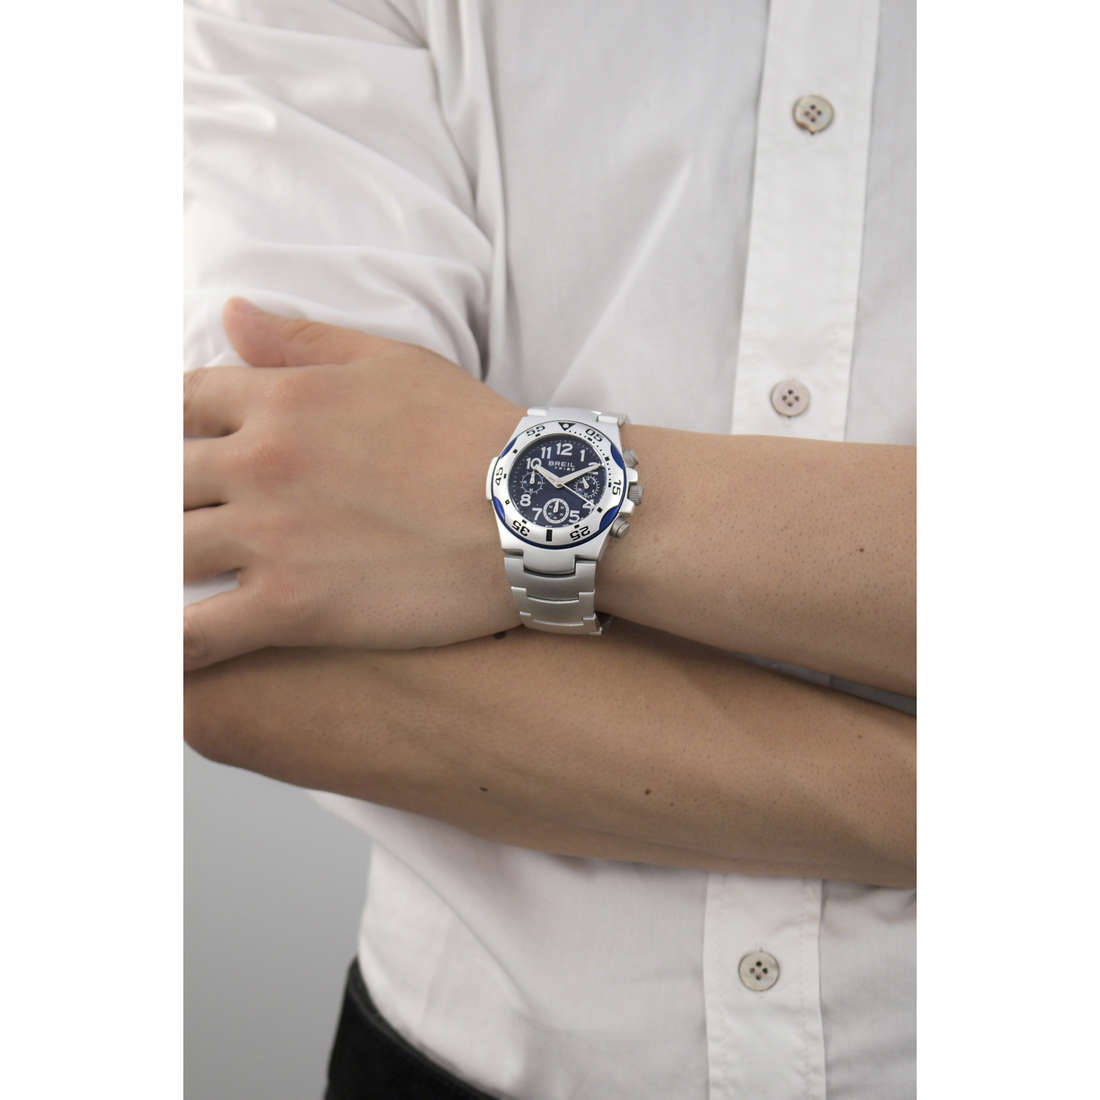 Breil cronografi Ice uomo EW0209 indosso